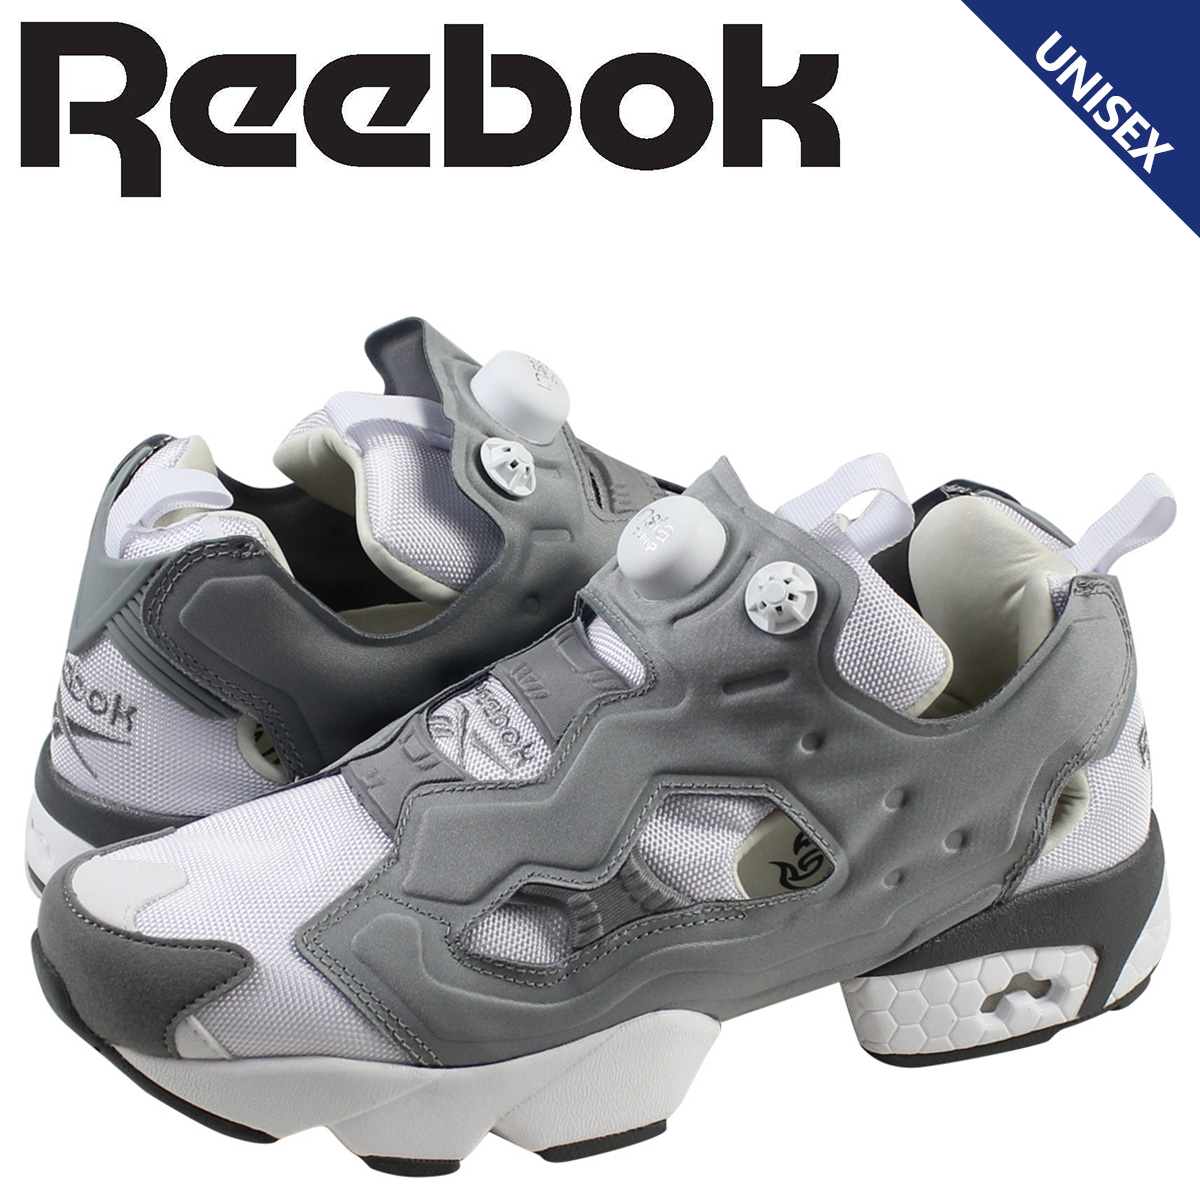 Whats up Sports  Reebok Reebok pump fury sneakers INSTA PUMP FURY OG M48560  men s women s shoes grey  a7f9814ca